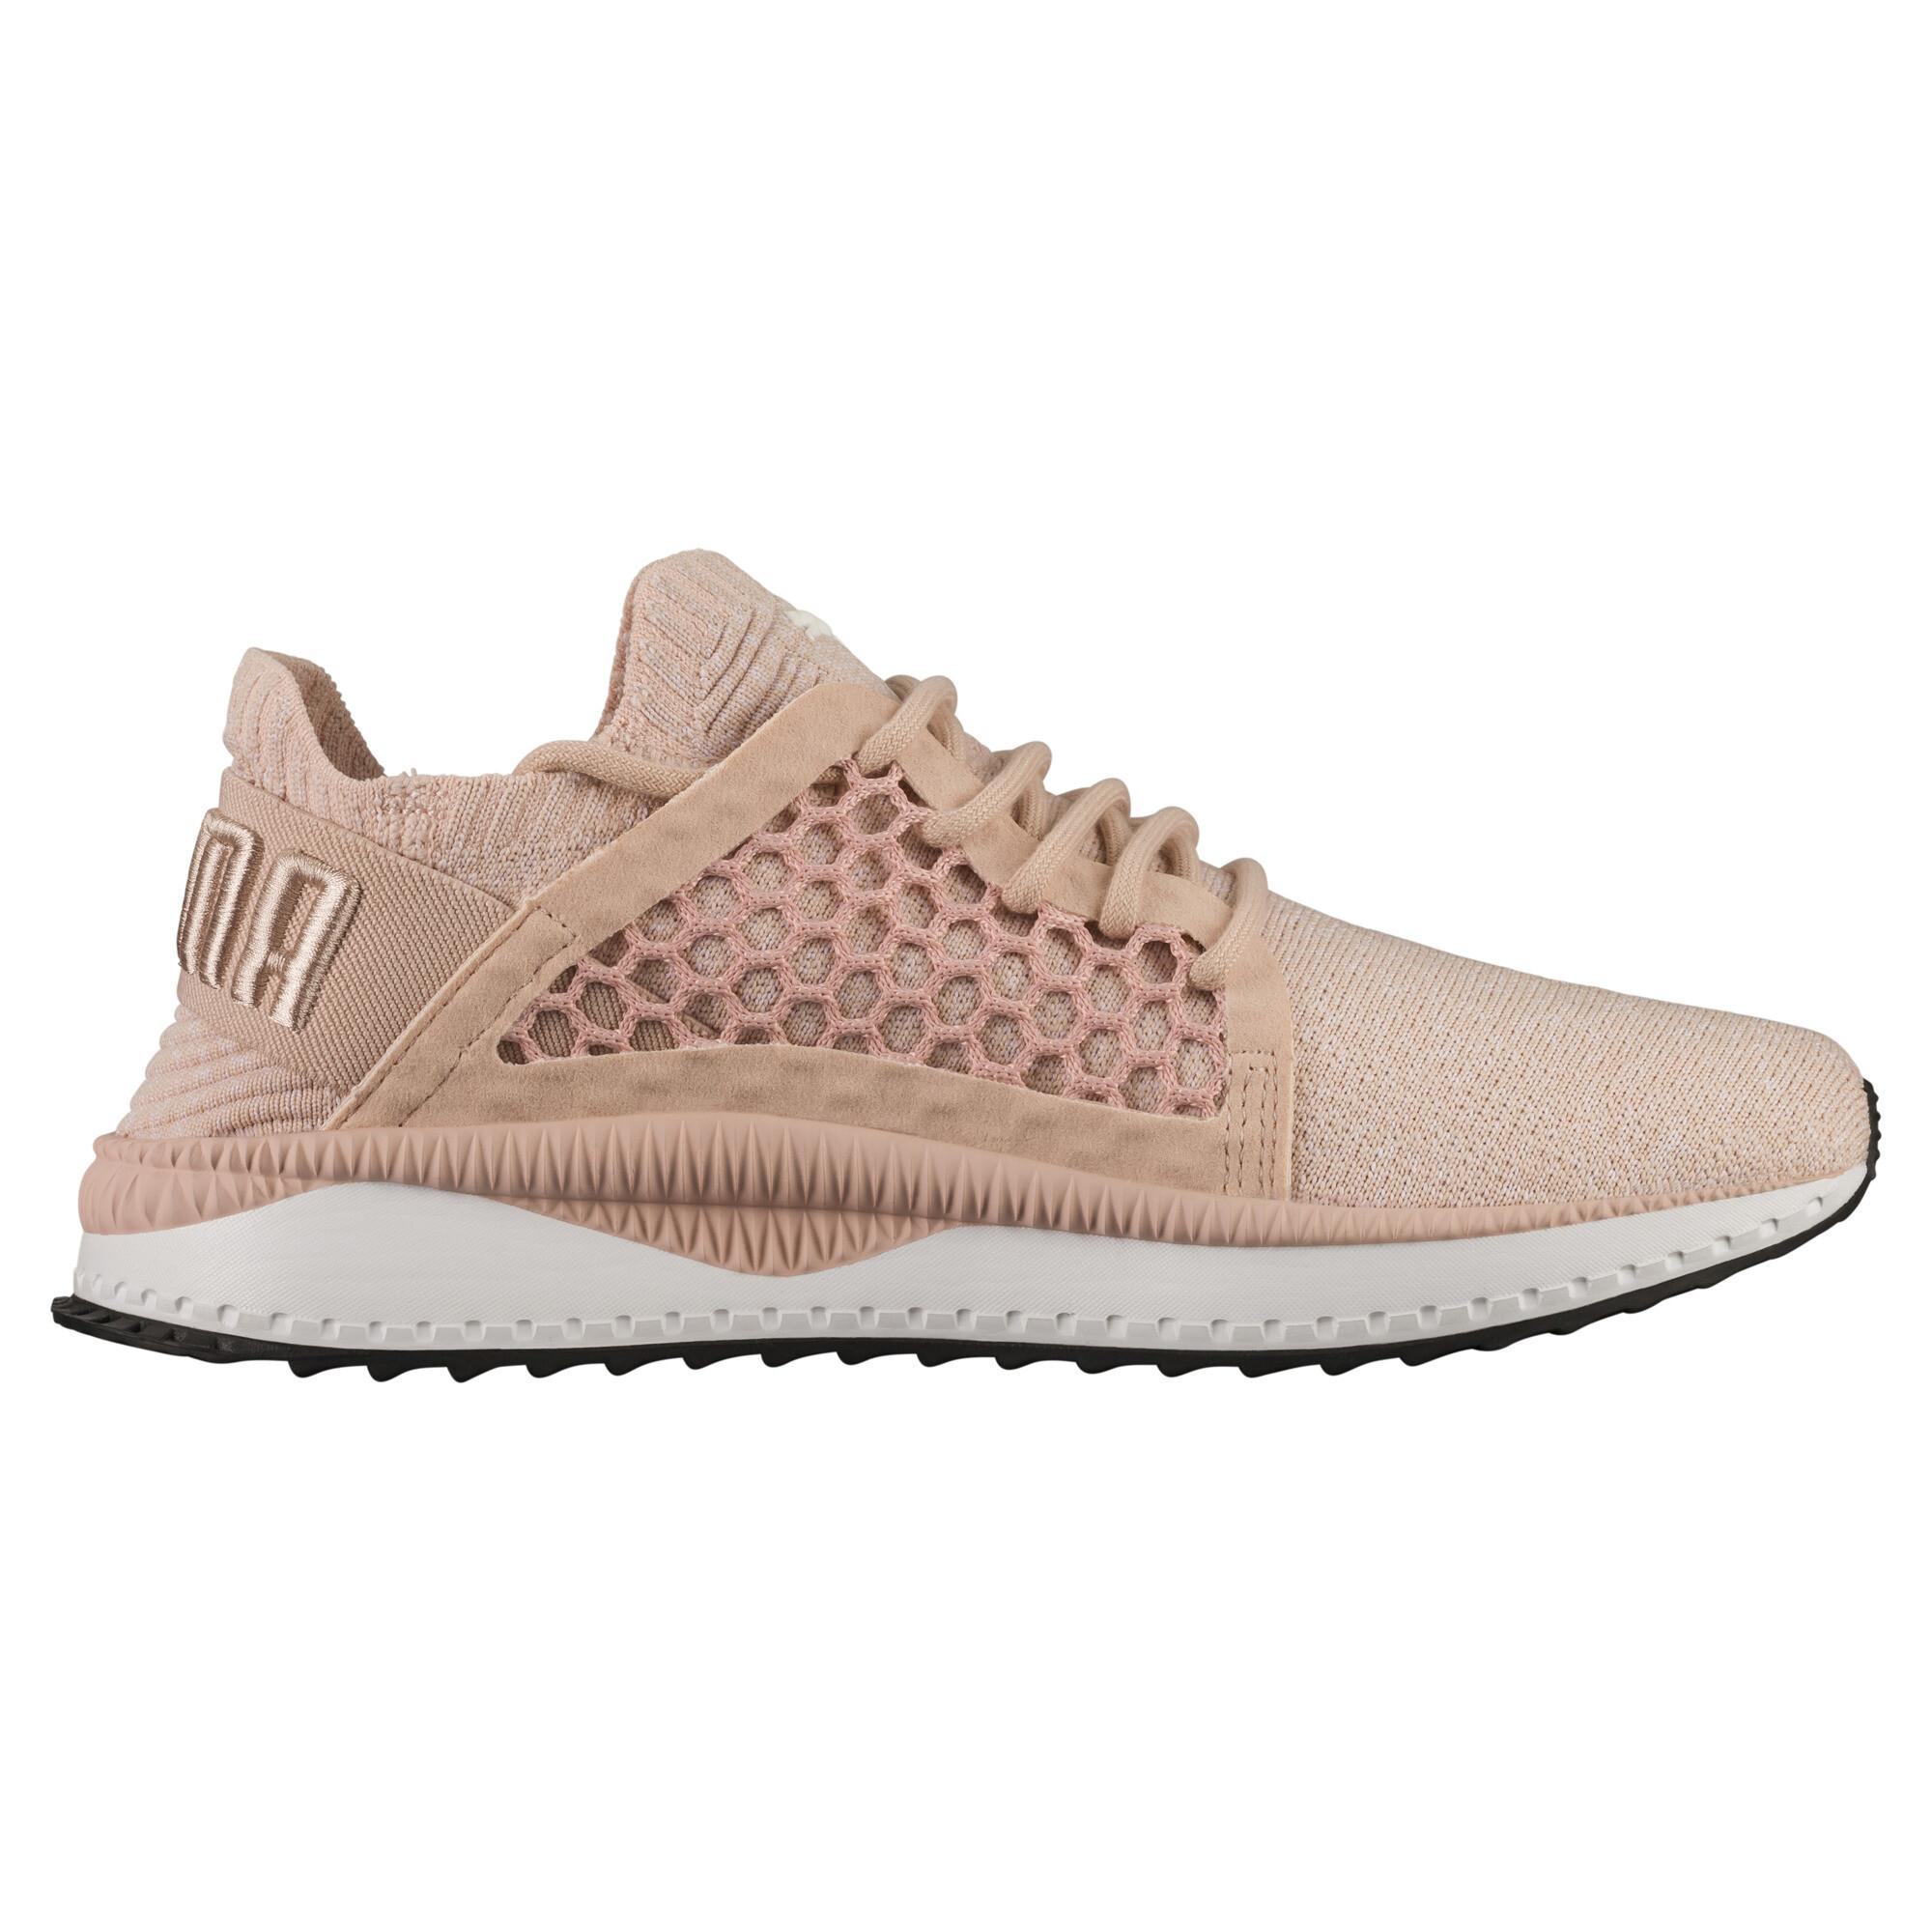 PUMA-TSUGI-NETFIT-evoKNIT-Sneaker-Frauen-Schuhe-Neu Indexbild 17